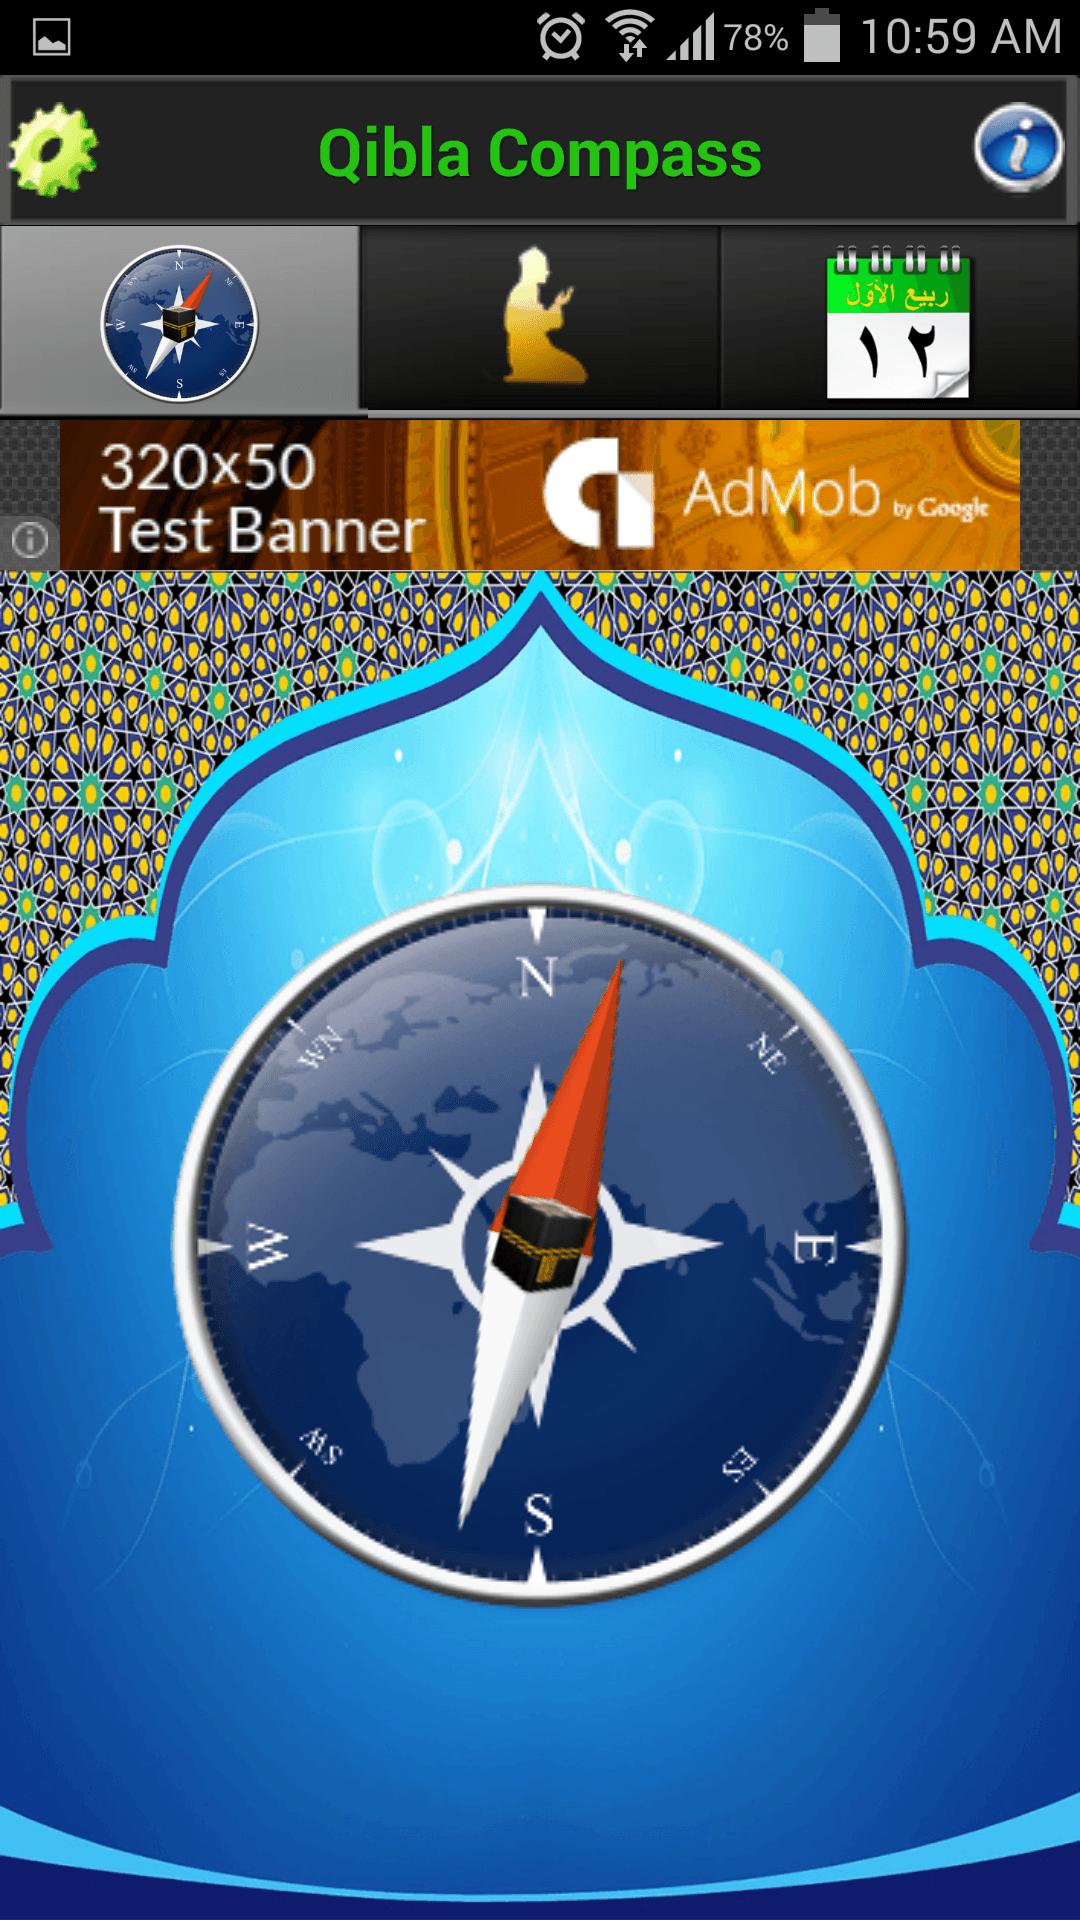 Mecca Compass App Pro Compass app, Islamic compass, Compass